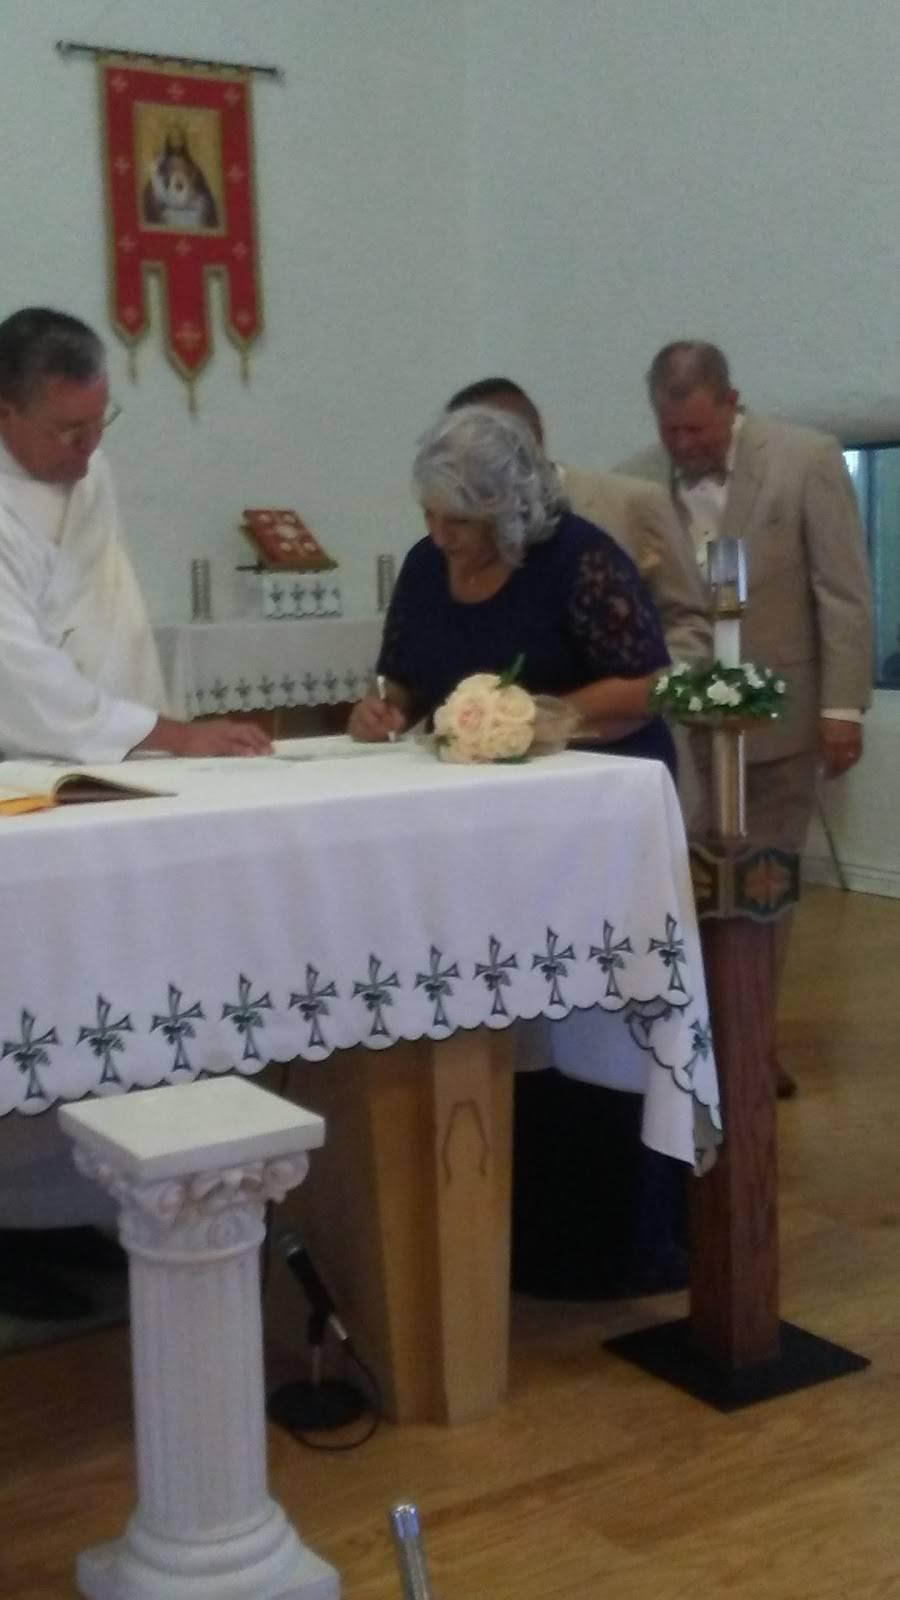 San Ignacio Catholic Church - church  | Photo 2 of 8 | Address: 1300 Walter St NE, Albuquerque, NM 87102, USA | Phone: (505) 243-4287